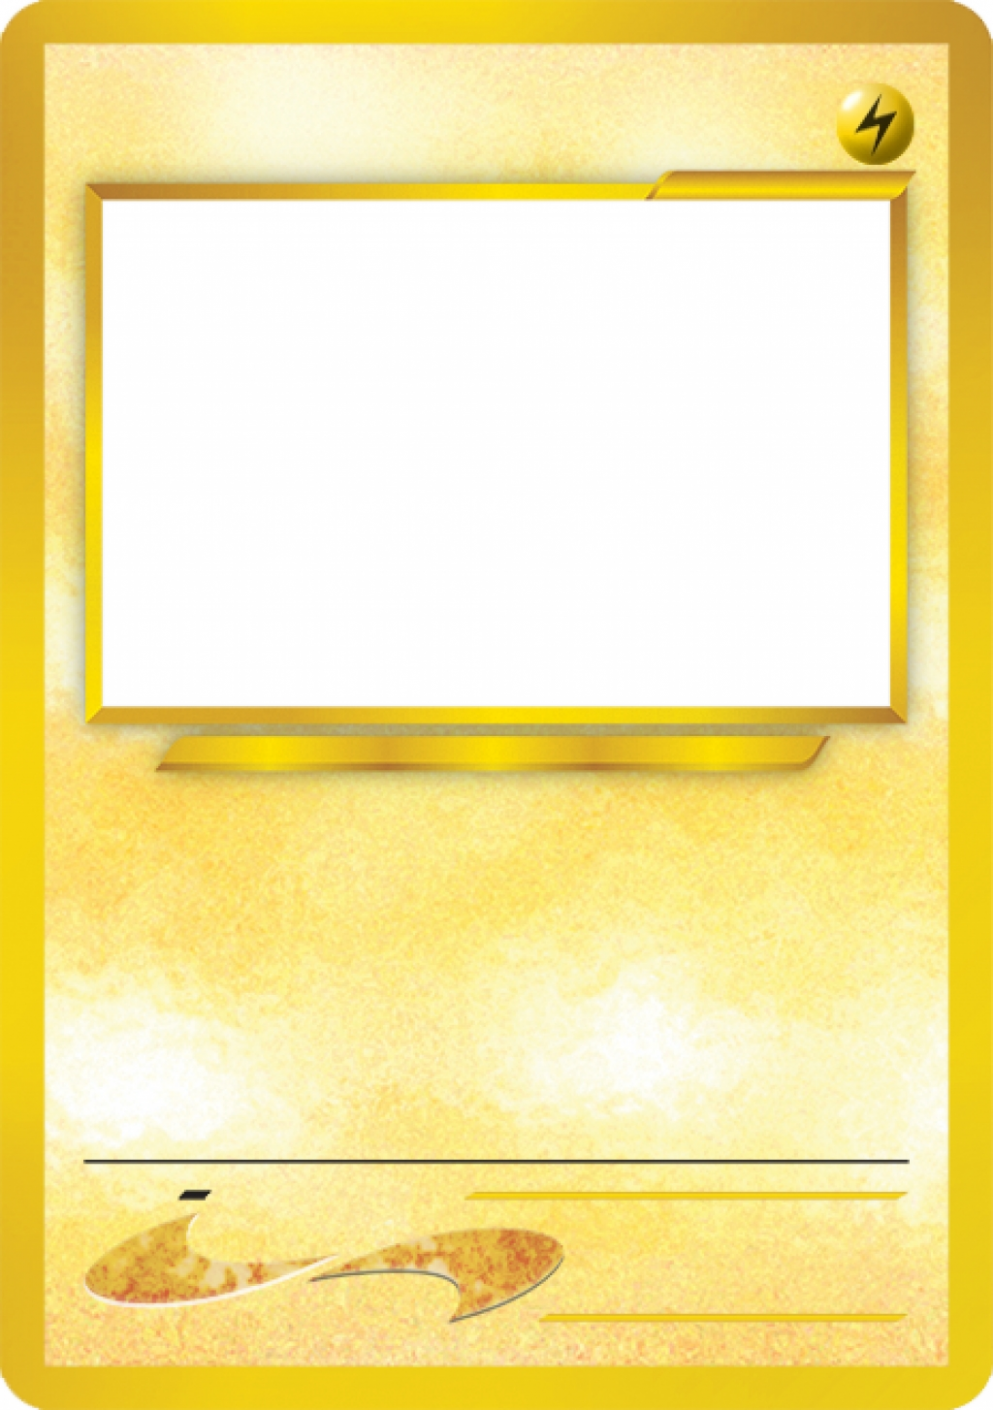 Blank Pokemon Card Pokemon Card Template Trading Card Template Pokemon Birthday Party